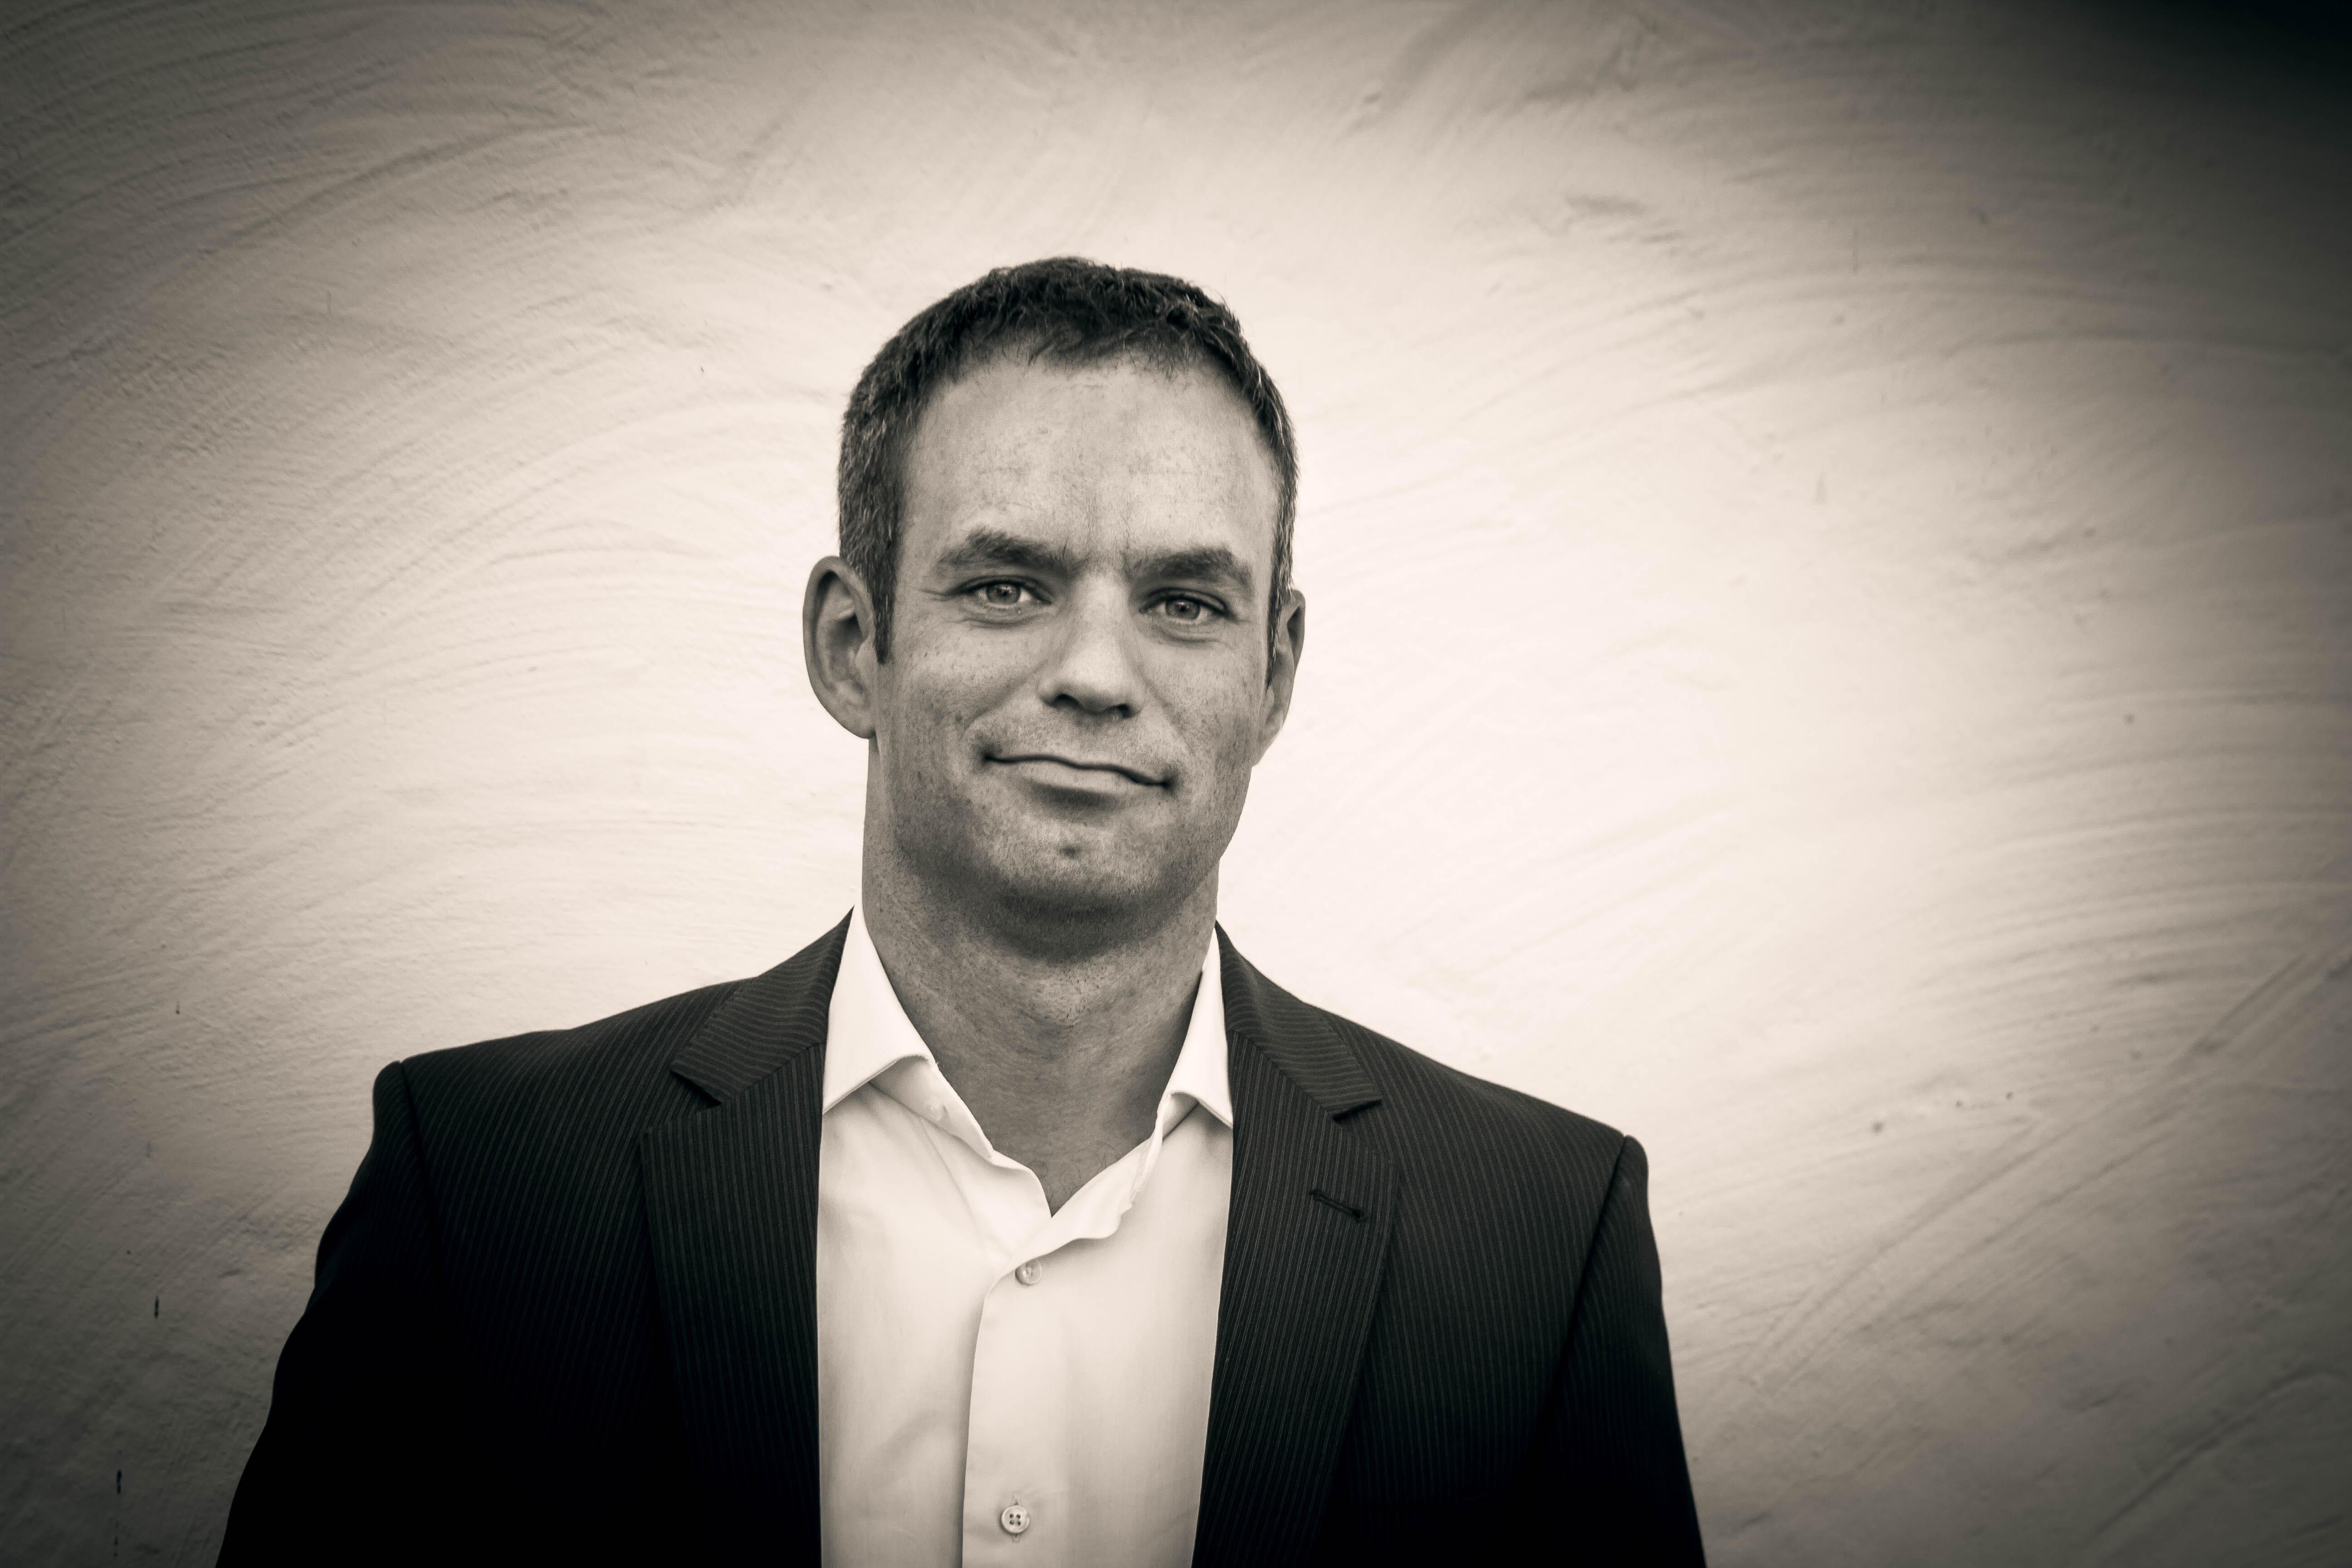 Hermann Hessel